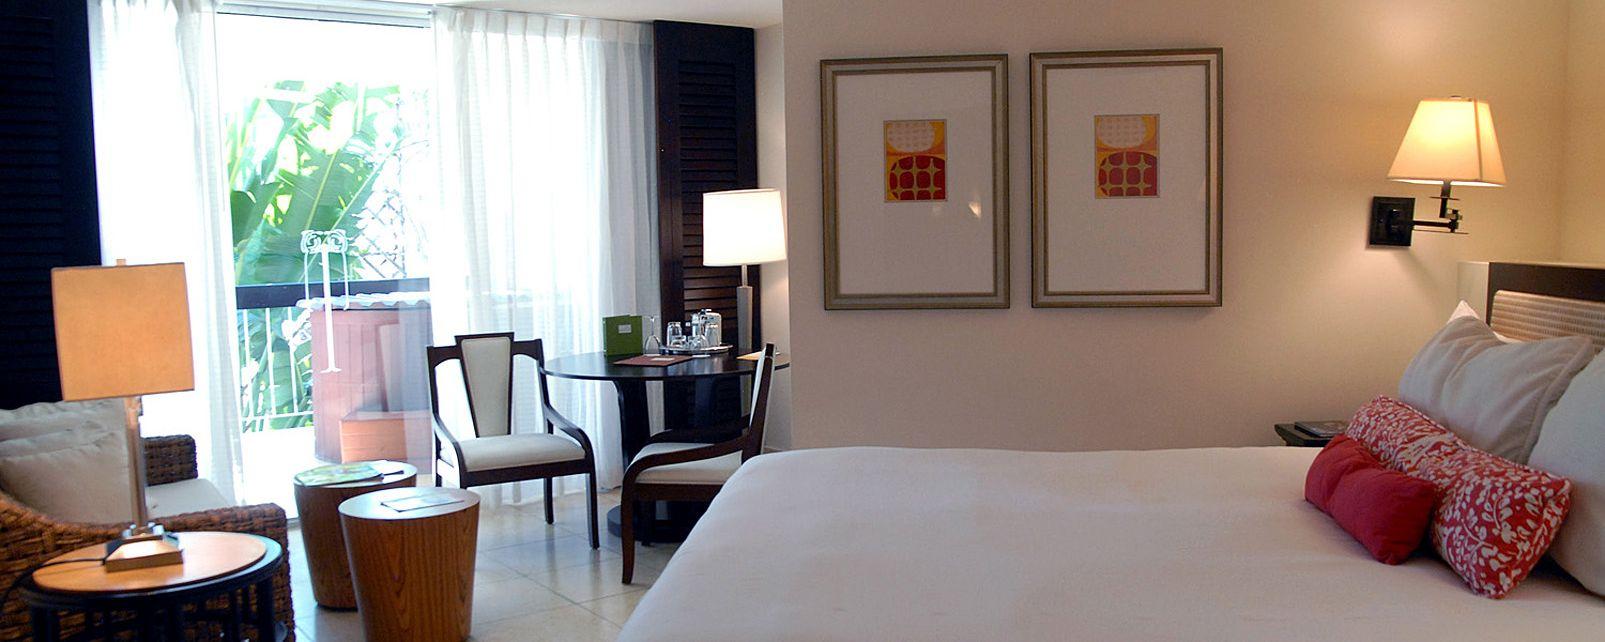 Hotel Mayfair Hotel & Spa